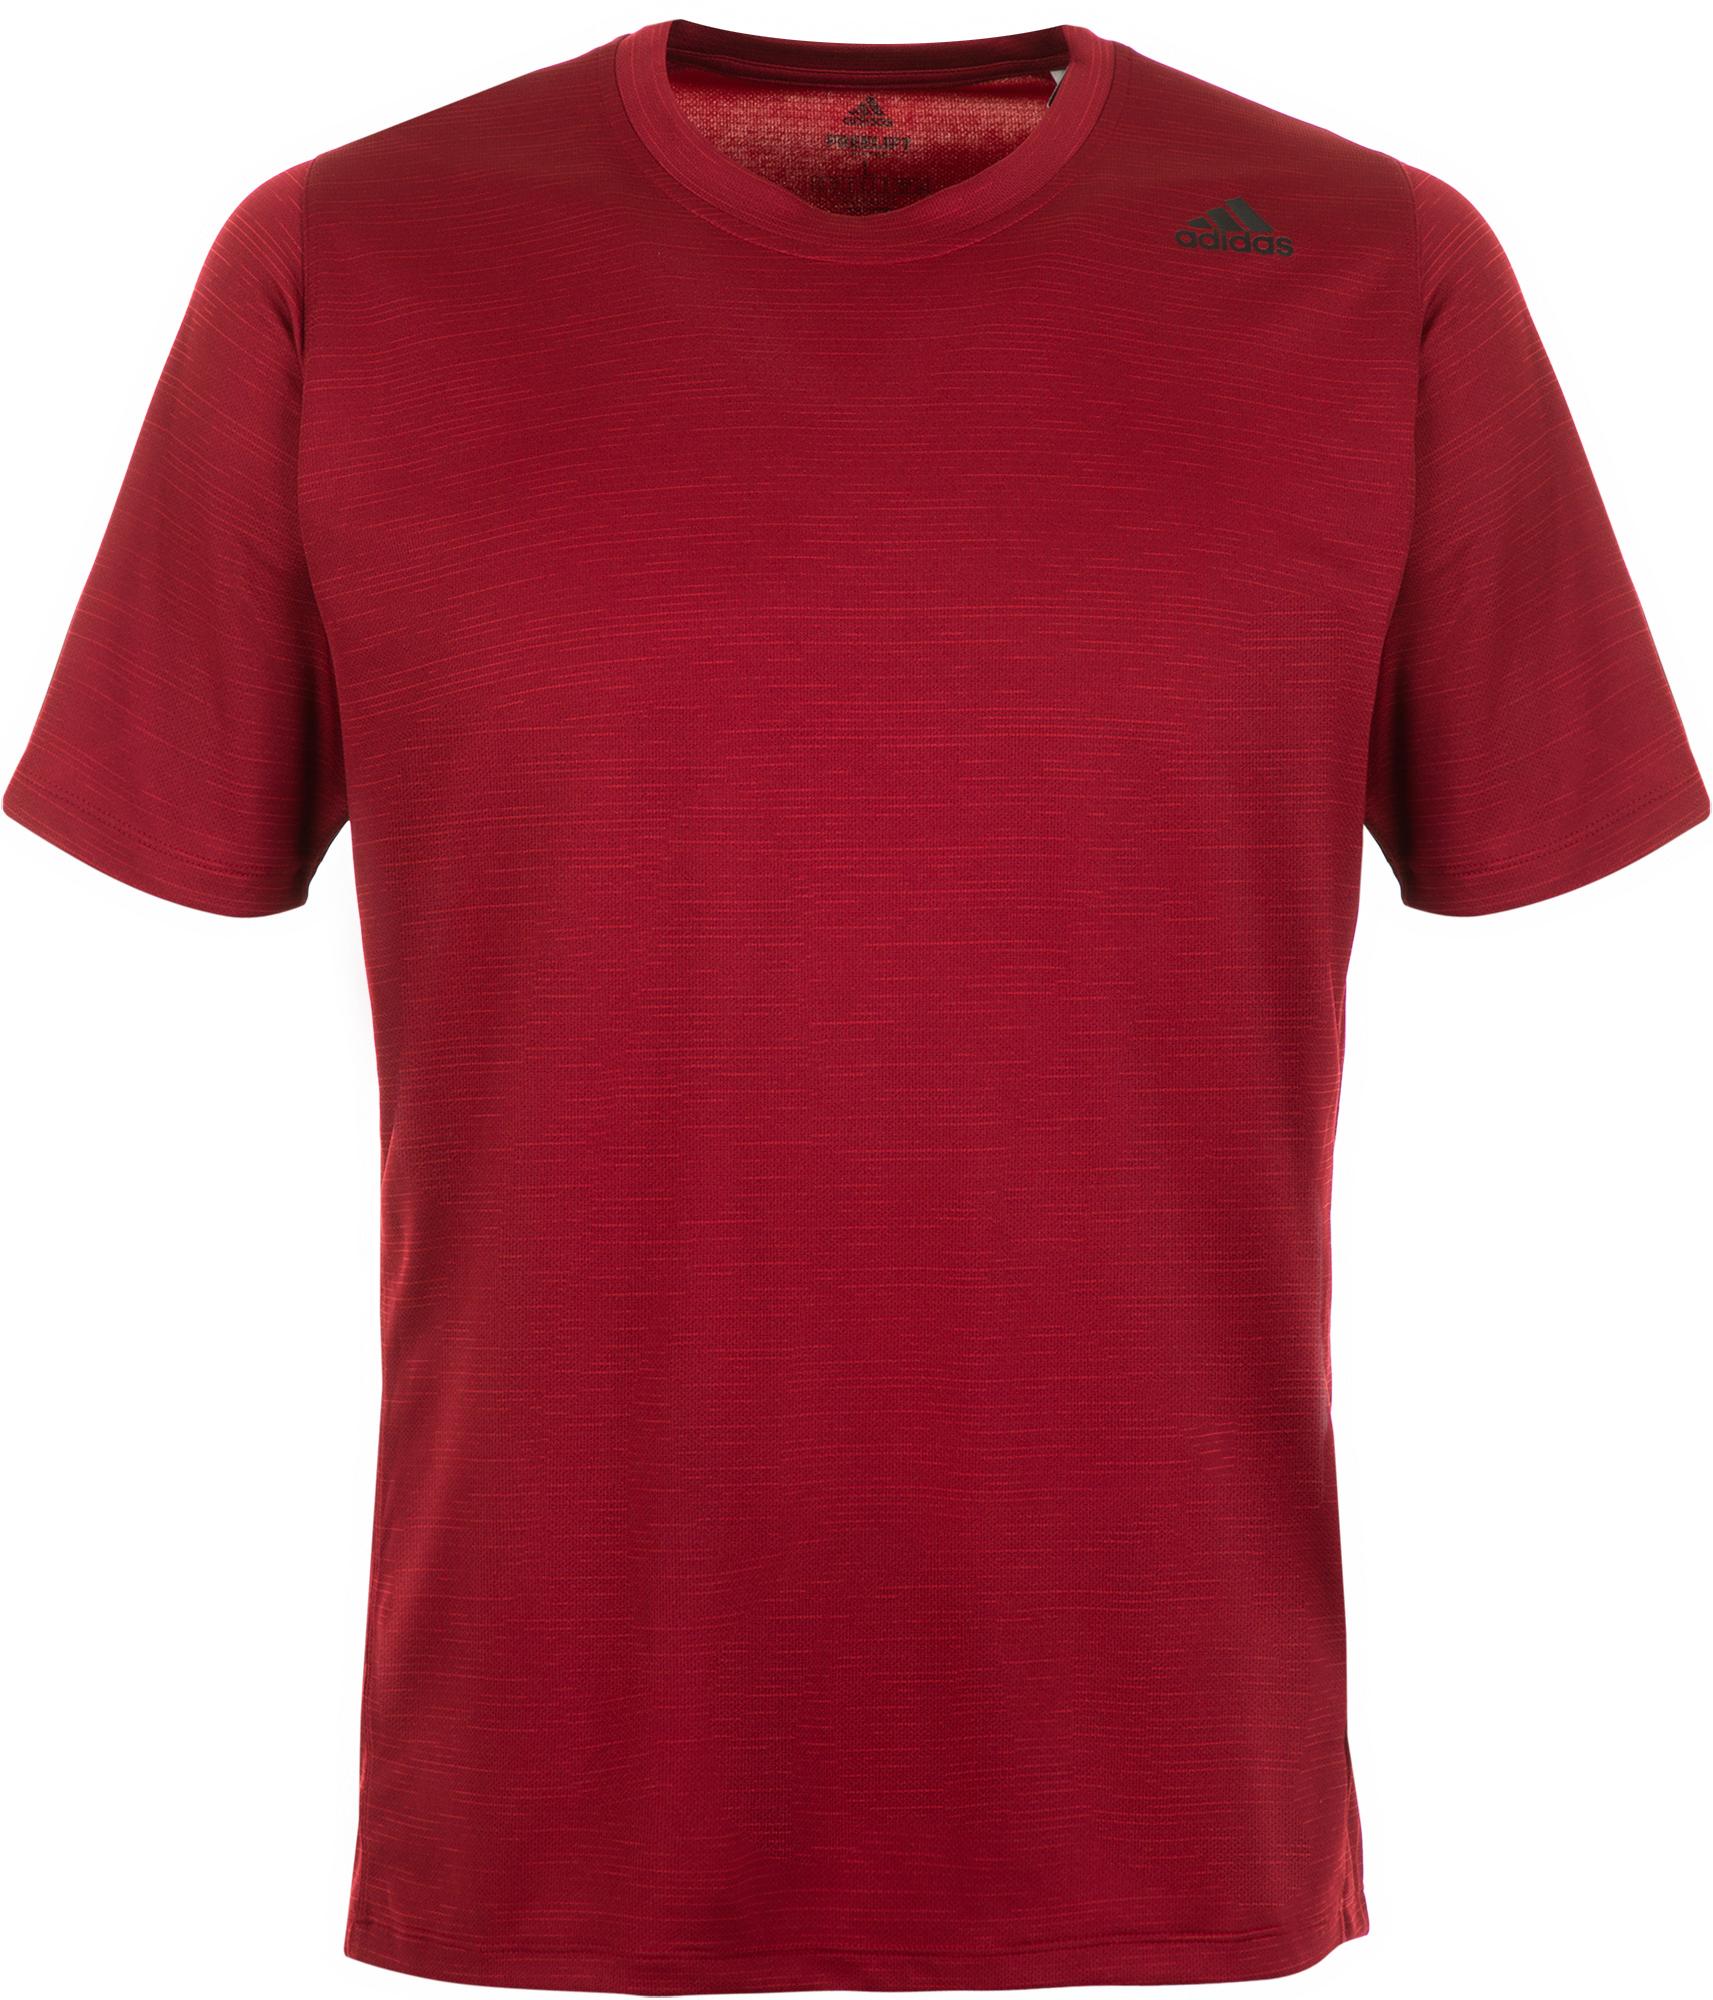 Adidas Футболка мужская FreeLift Tech, размер 52